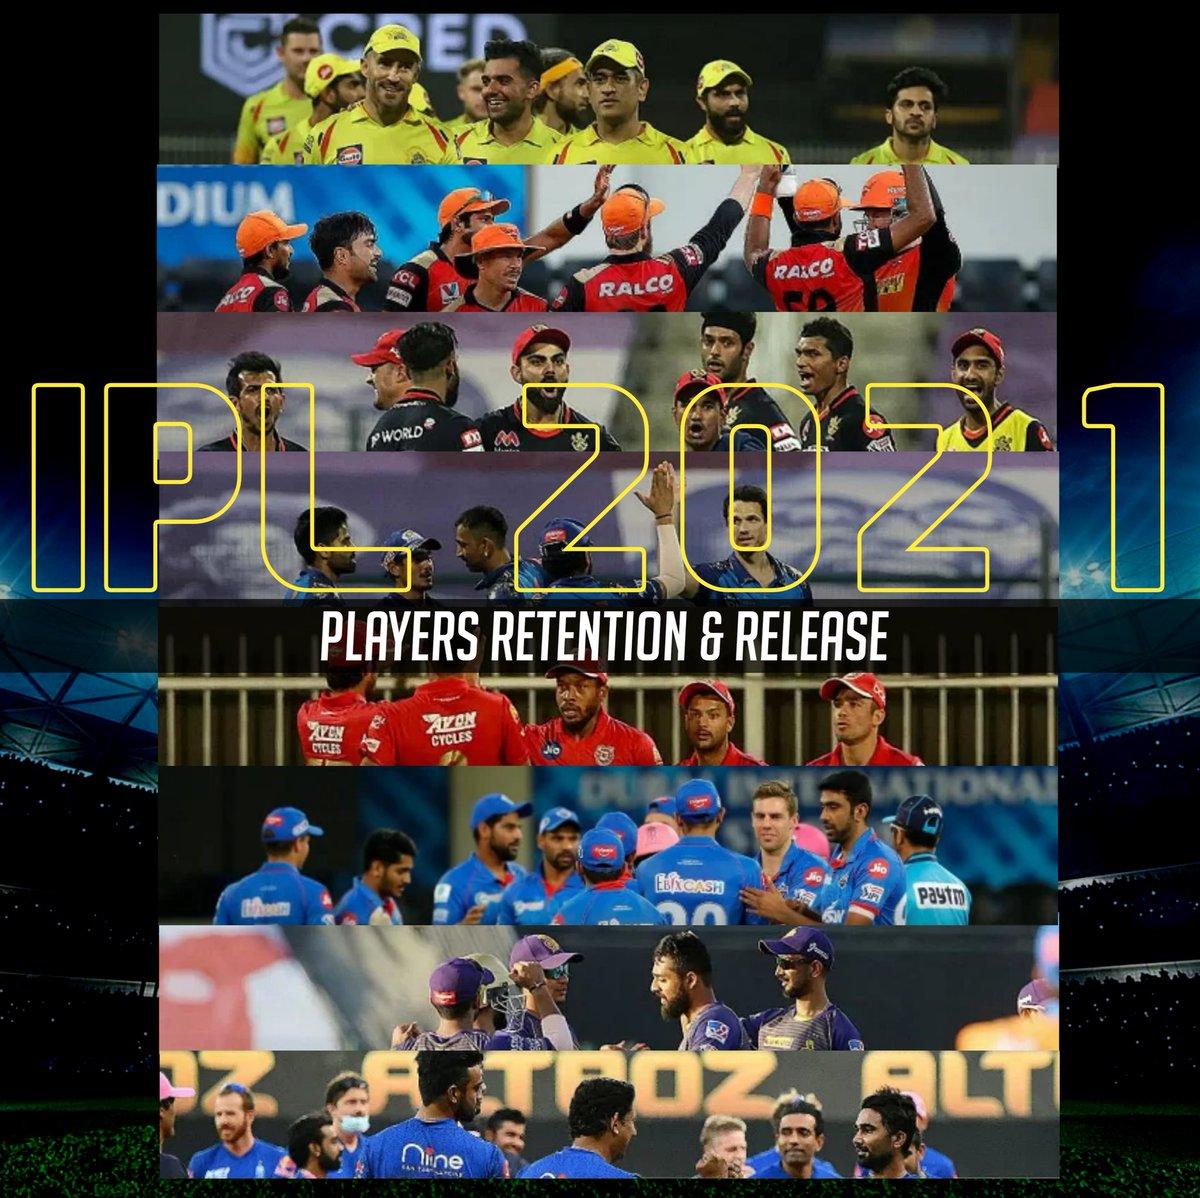 Indian Premier League 2021 🇮🇳🏏  🌟 Players Retentions 👇 🌟 Players Release 👇  Courtesy - CricTracker  #Cricket #IPL2020 #IPL #IPLT20 #Dream11ipl #MI #CSK #RCB #RR #KXIP #DC #SRH #KKR #IPL2021Auction #INDvAUS #IPLAuction #ViratKohli #MSDhoni #rohitsharma